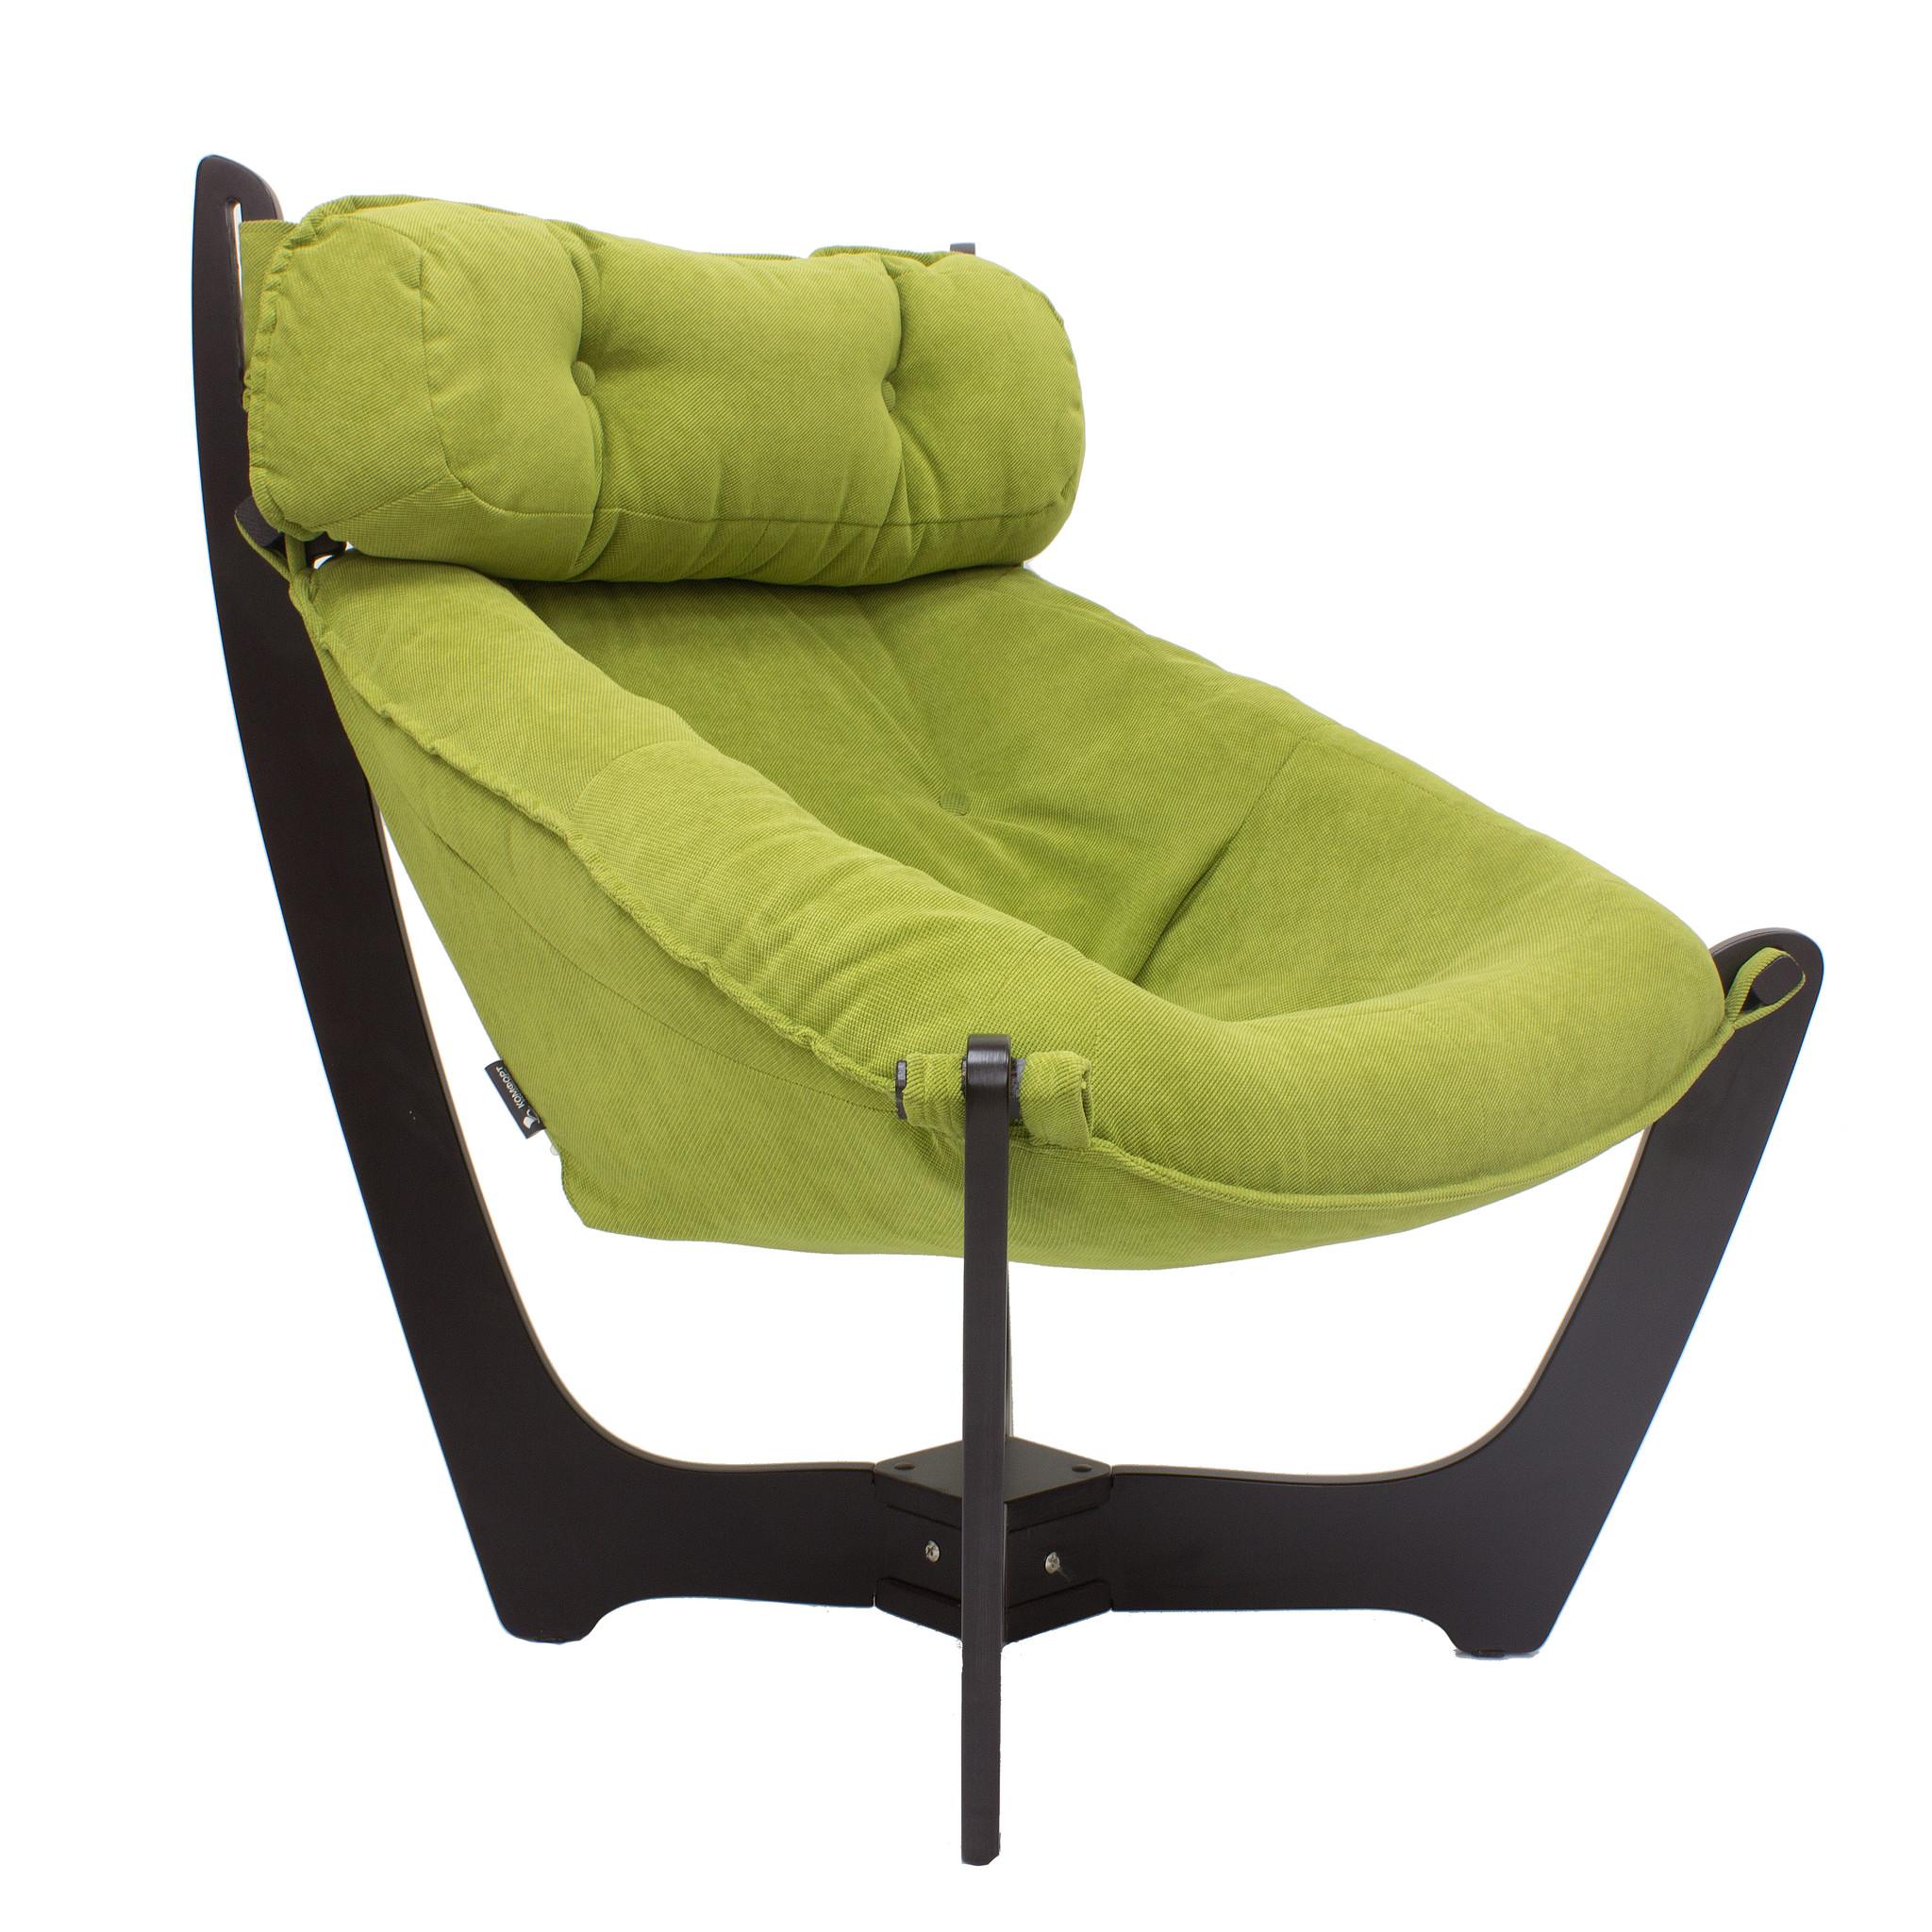 Кресло Комфорт model-11 (7555)